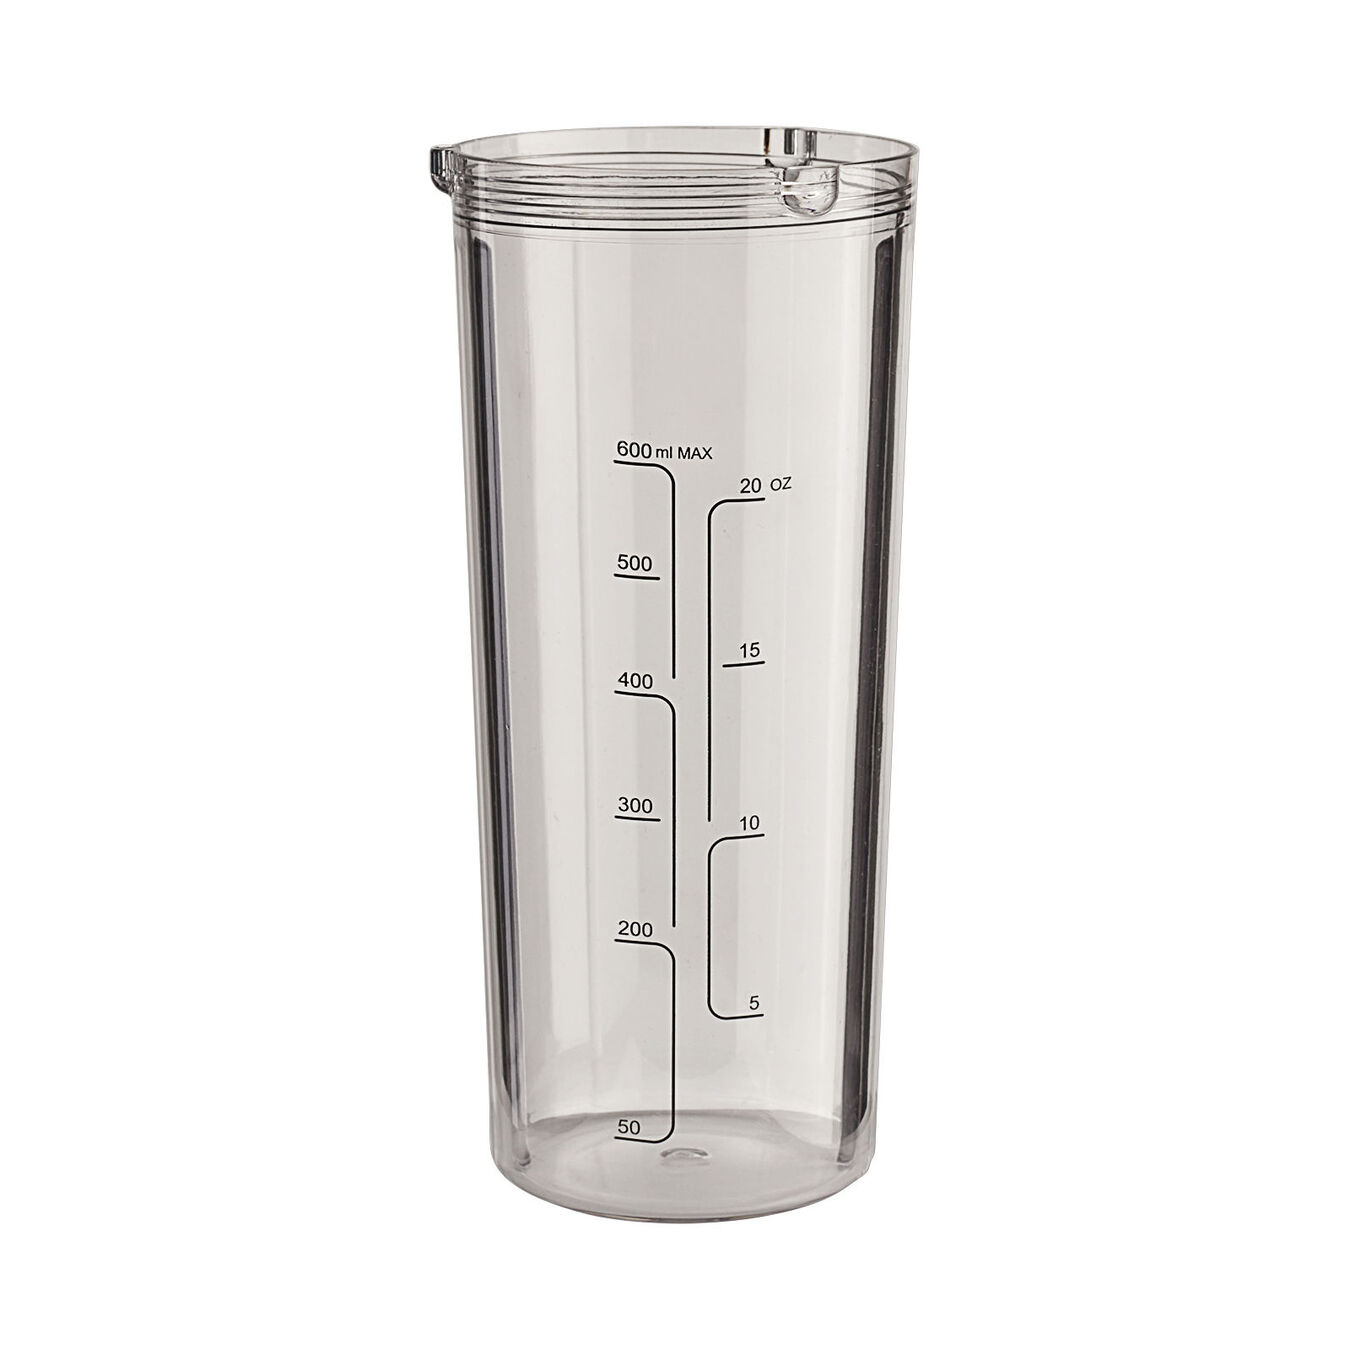 Table blender - grey,,large 5